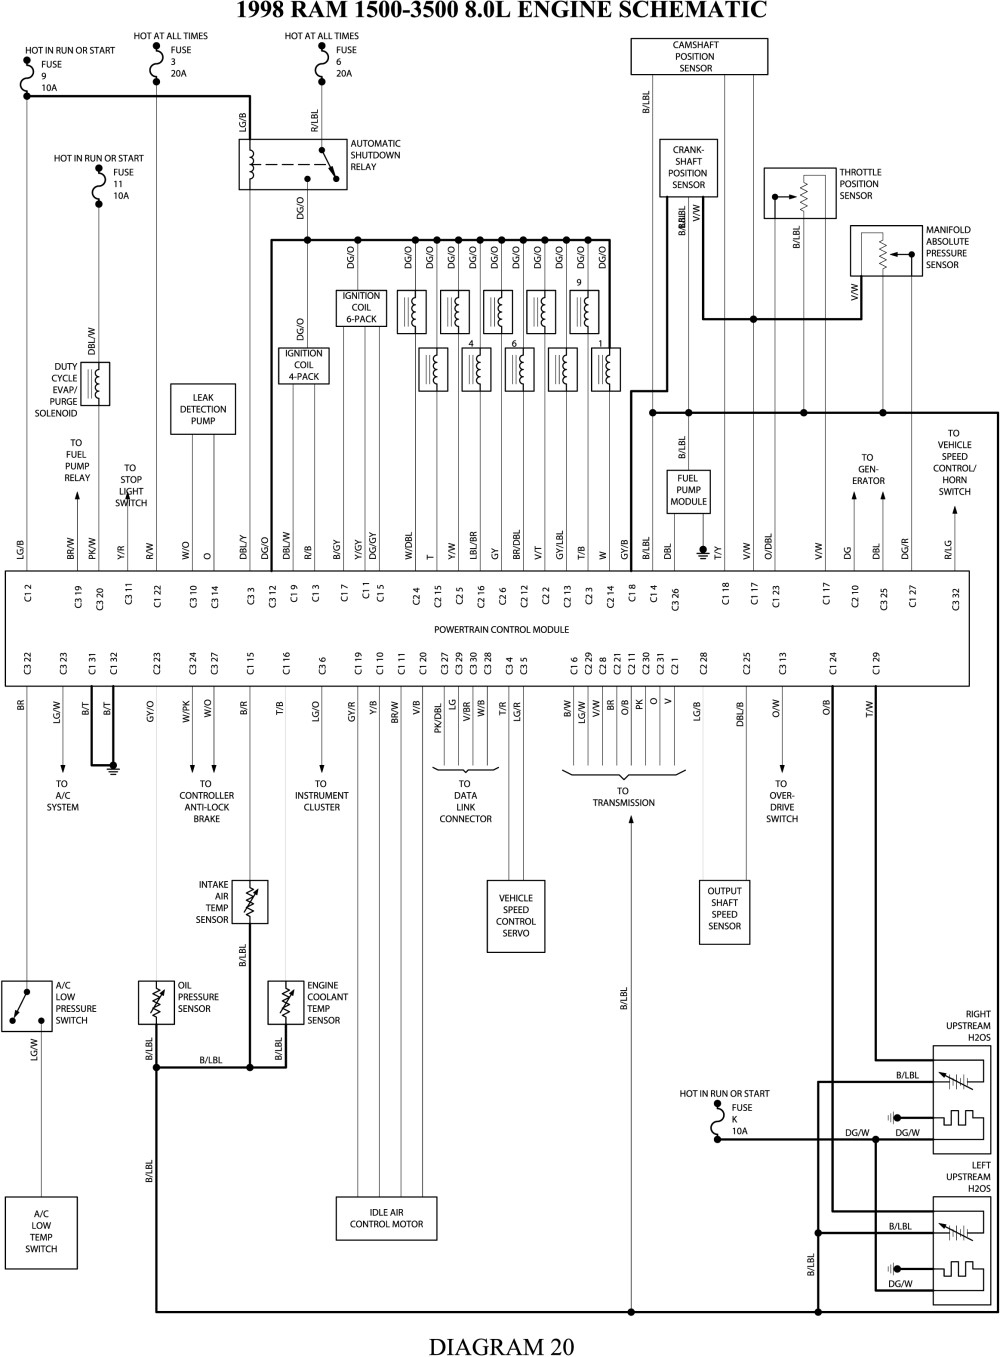 1997 Dodge Ram 1500 Alternator Wiring Diagram | Free Wiring Diagram - Dodge Alternator Wiring Diagram